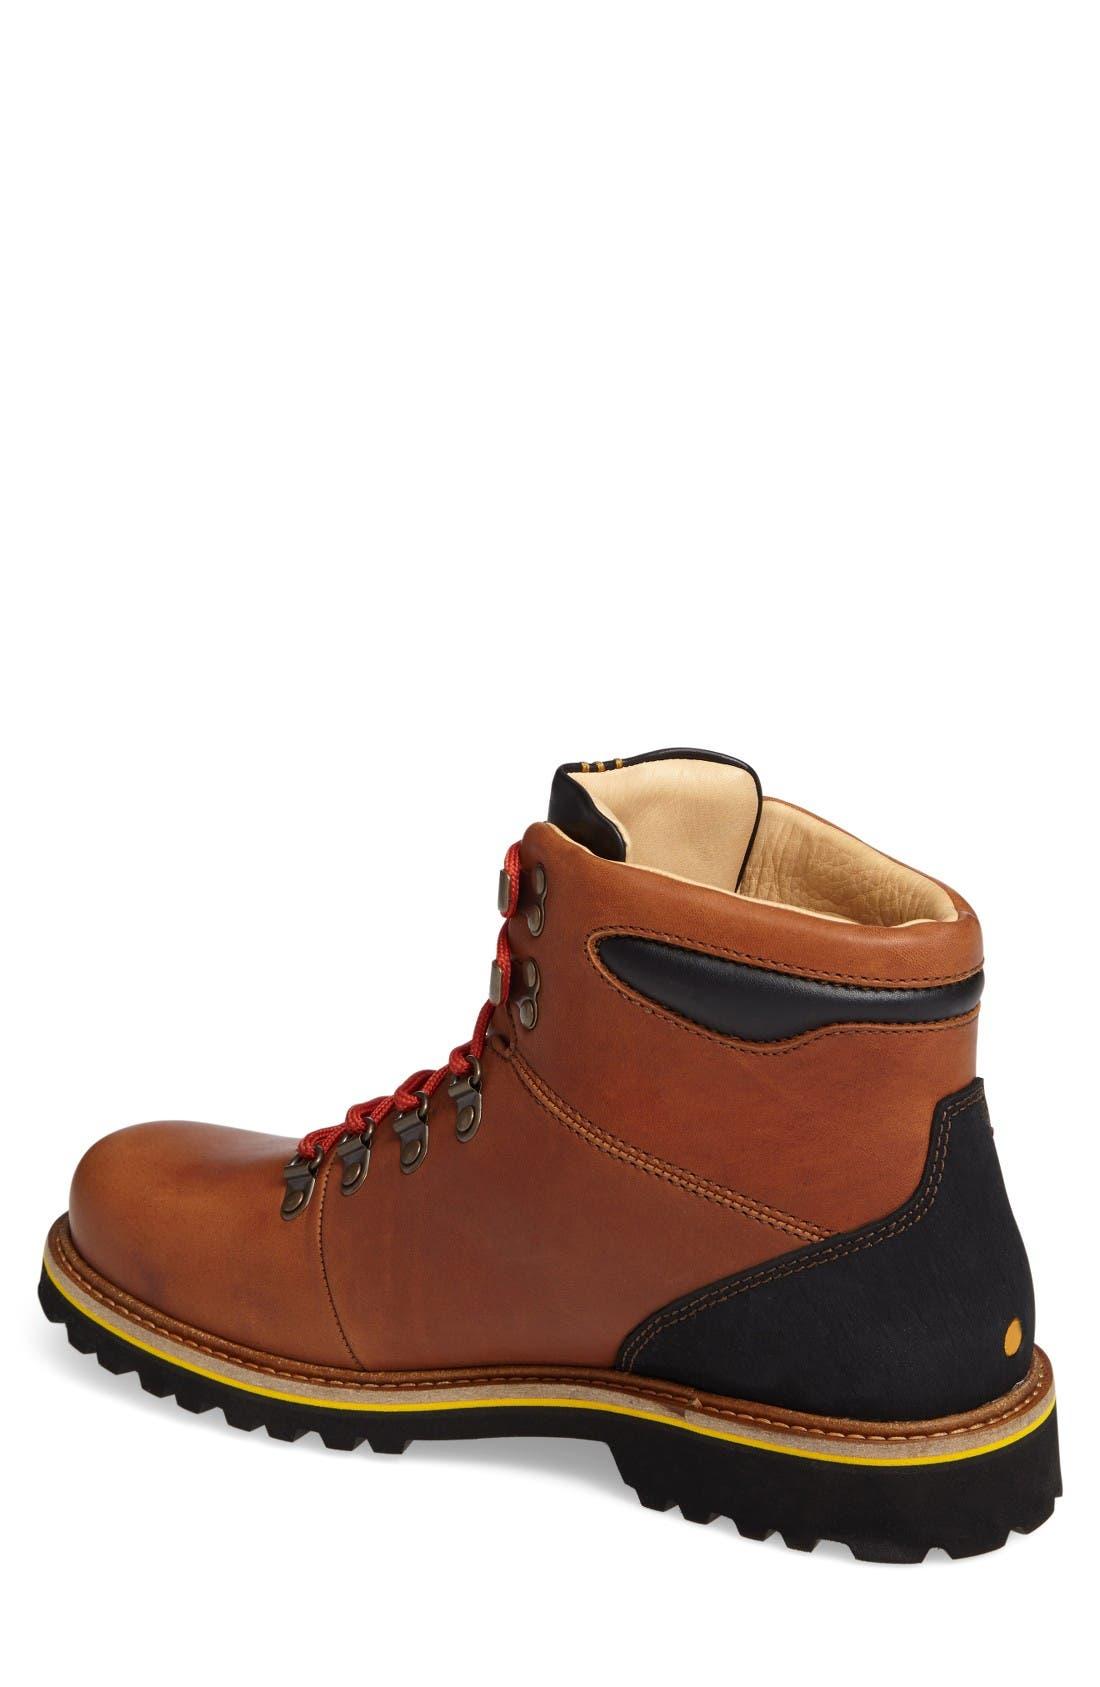 Alternate Image 2  - Samuel Hubbard Mt. Tam Hiking Boot (Men)